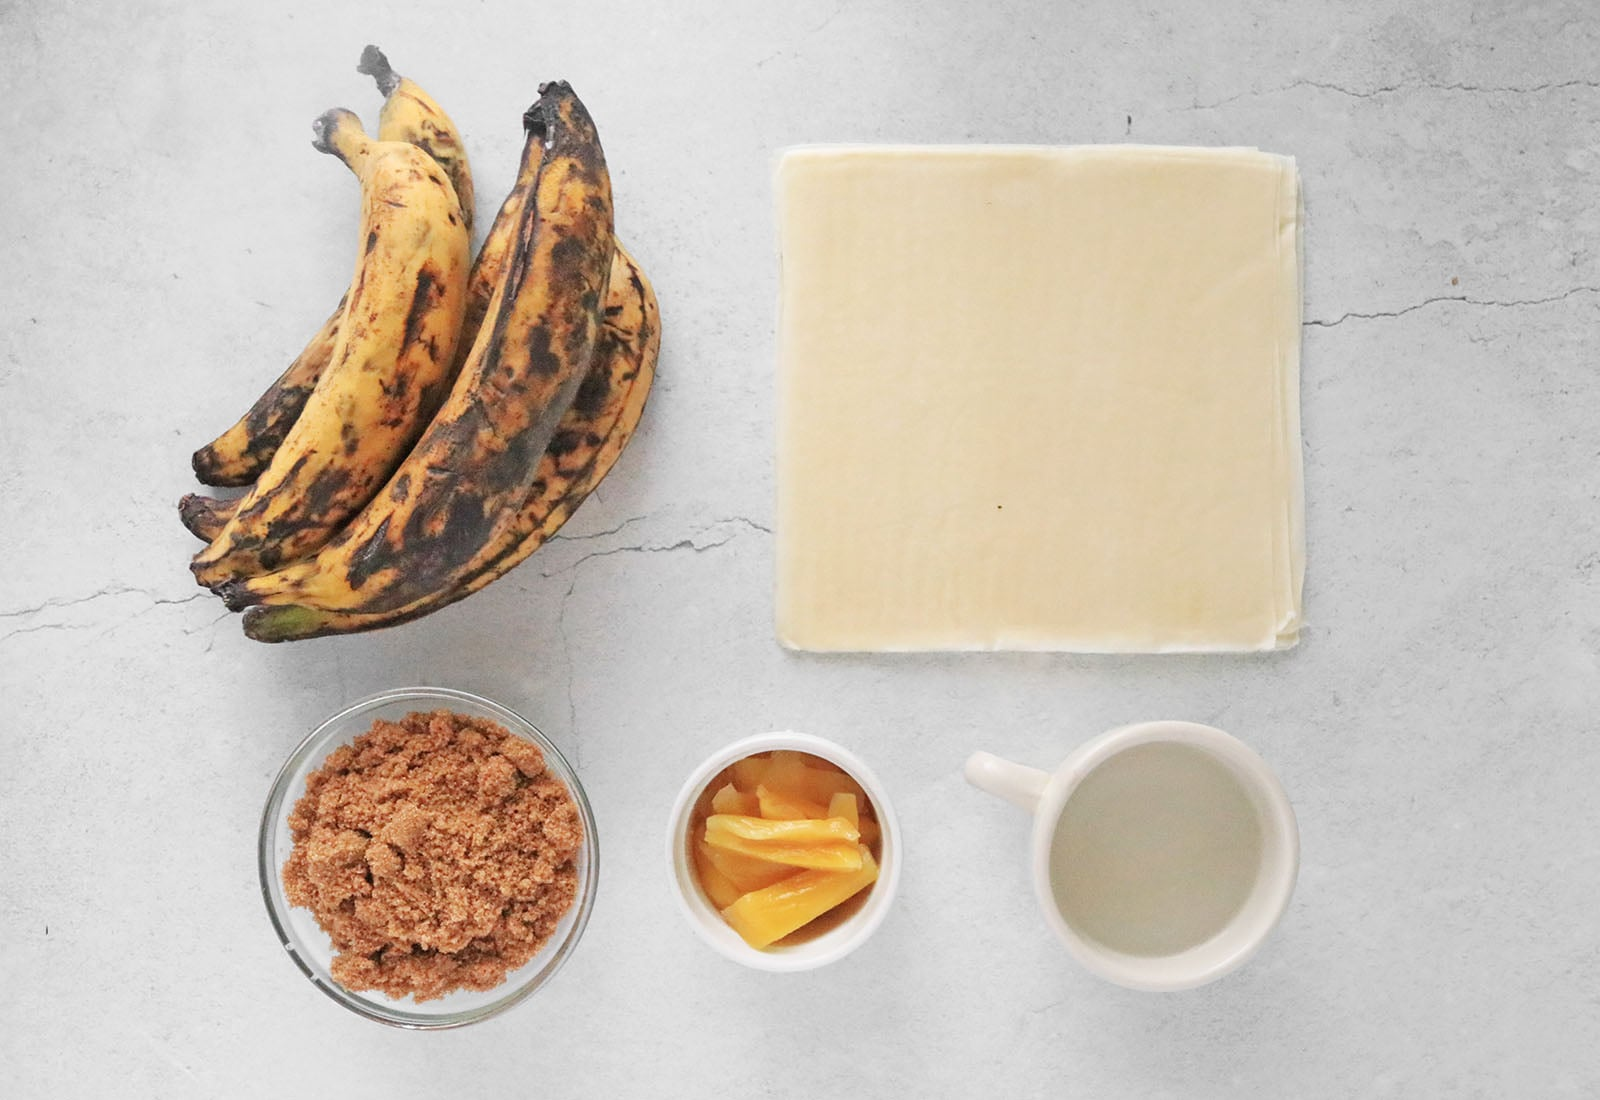 Turon ingredients